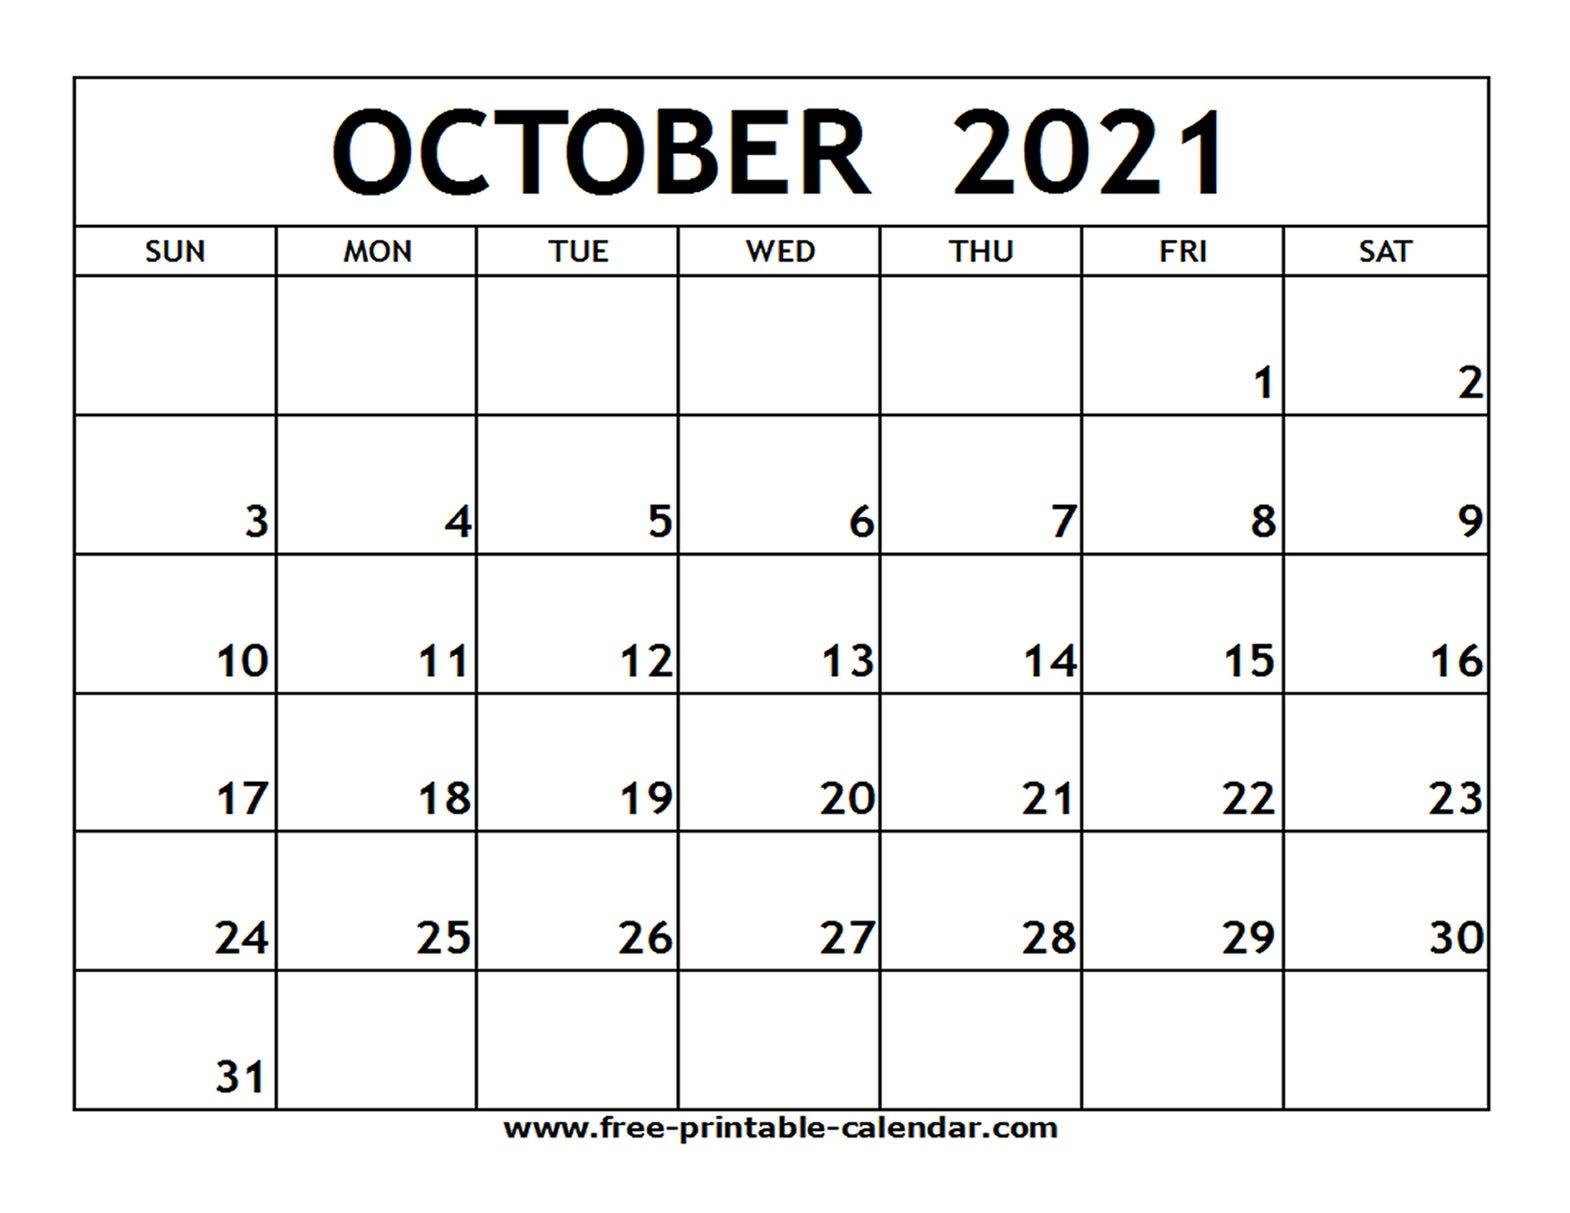 Printable October 2021 Calendar Editable   Free Printable Calendar regarding 2021 Julian Calendar Pdf Image